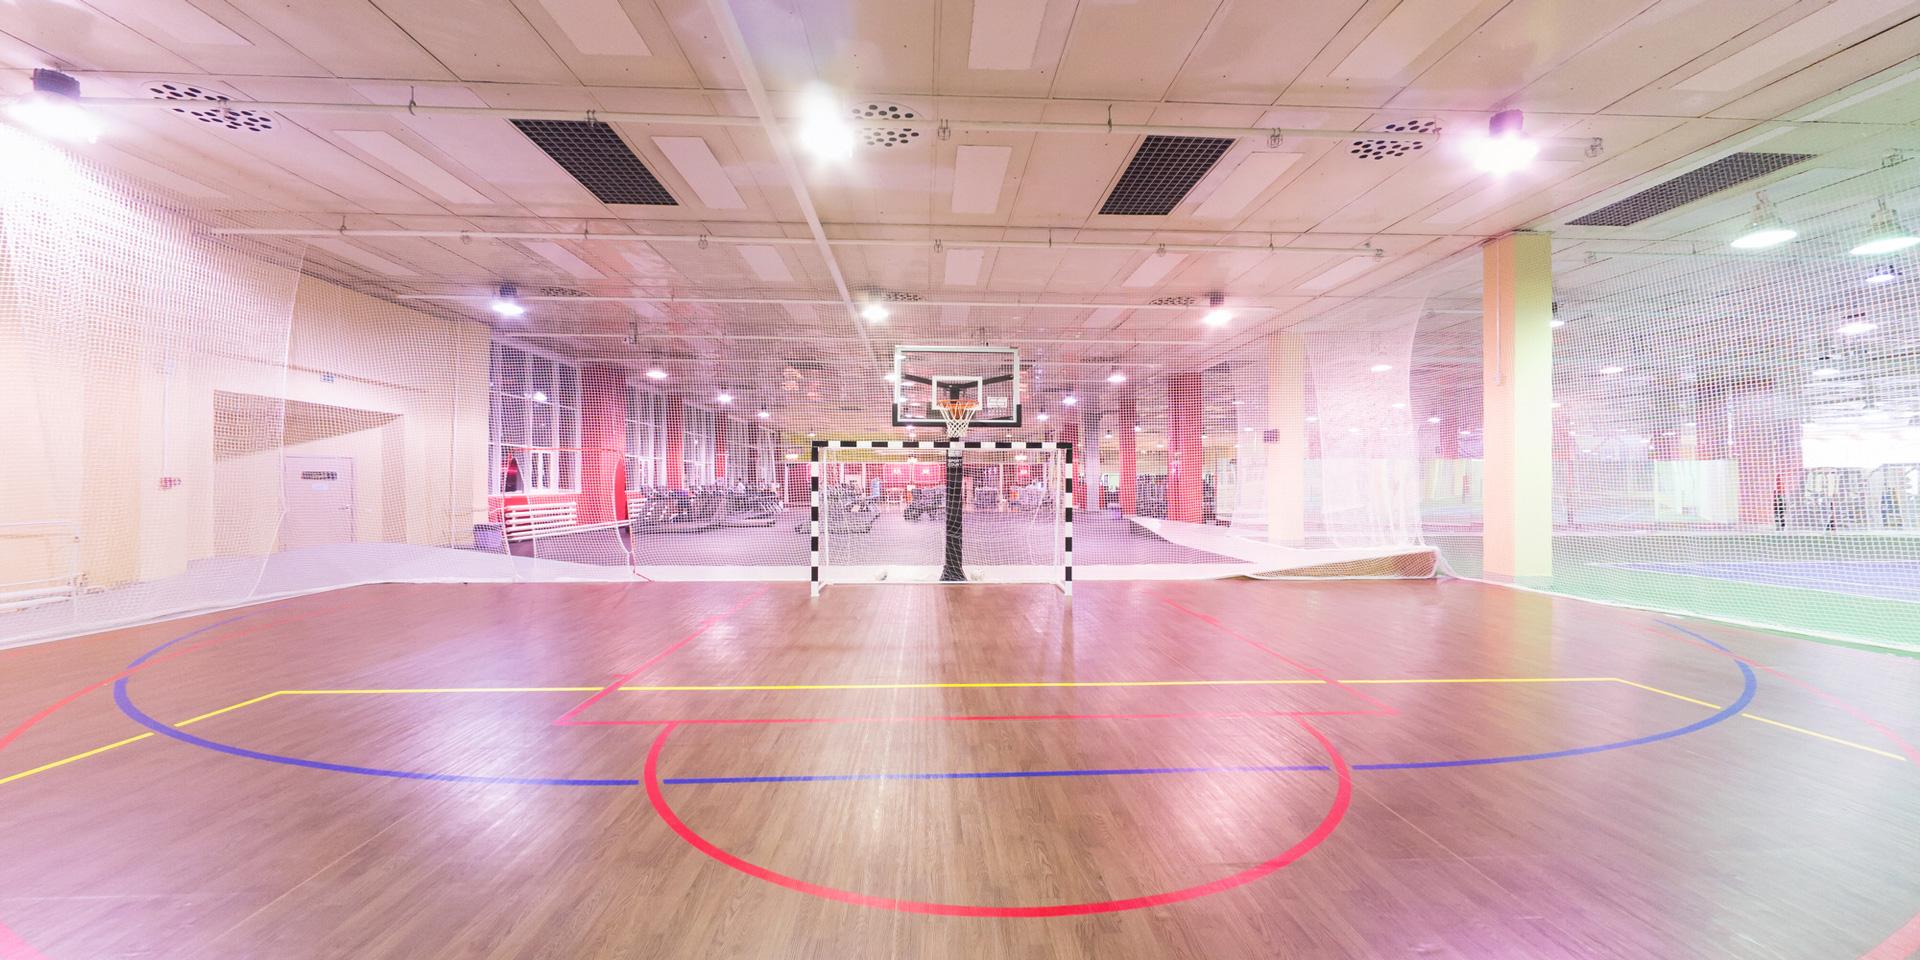 Съемка 360° виртуального тура из 14ти 3D панорам по фитнес-клубу ExtremeFitness Новосибирск